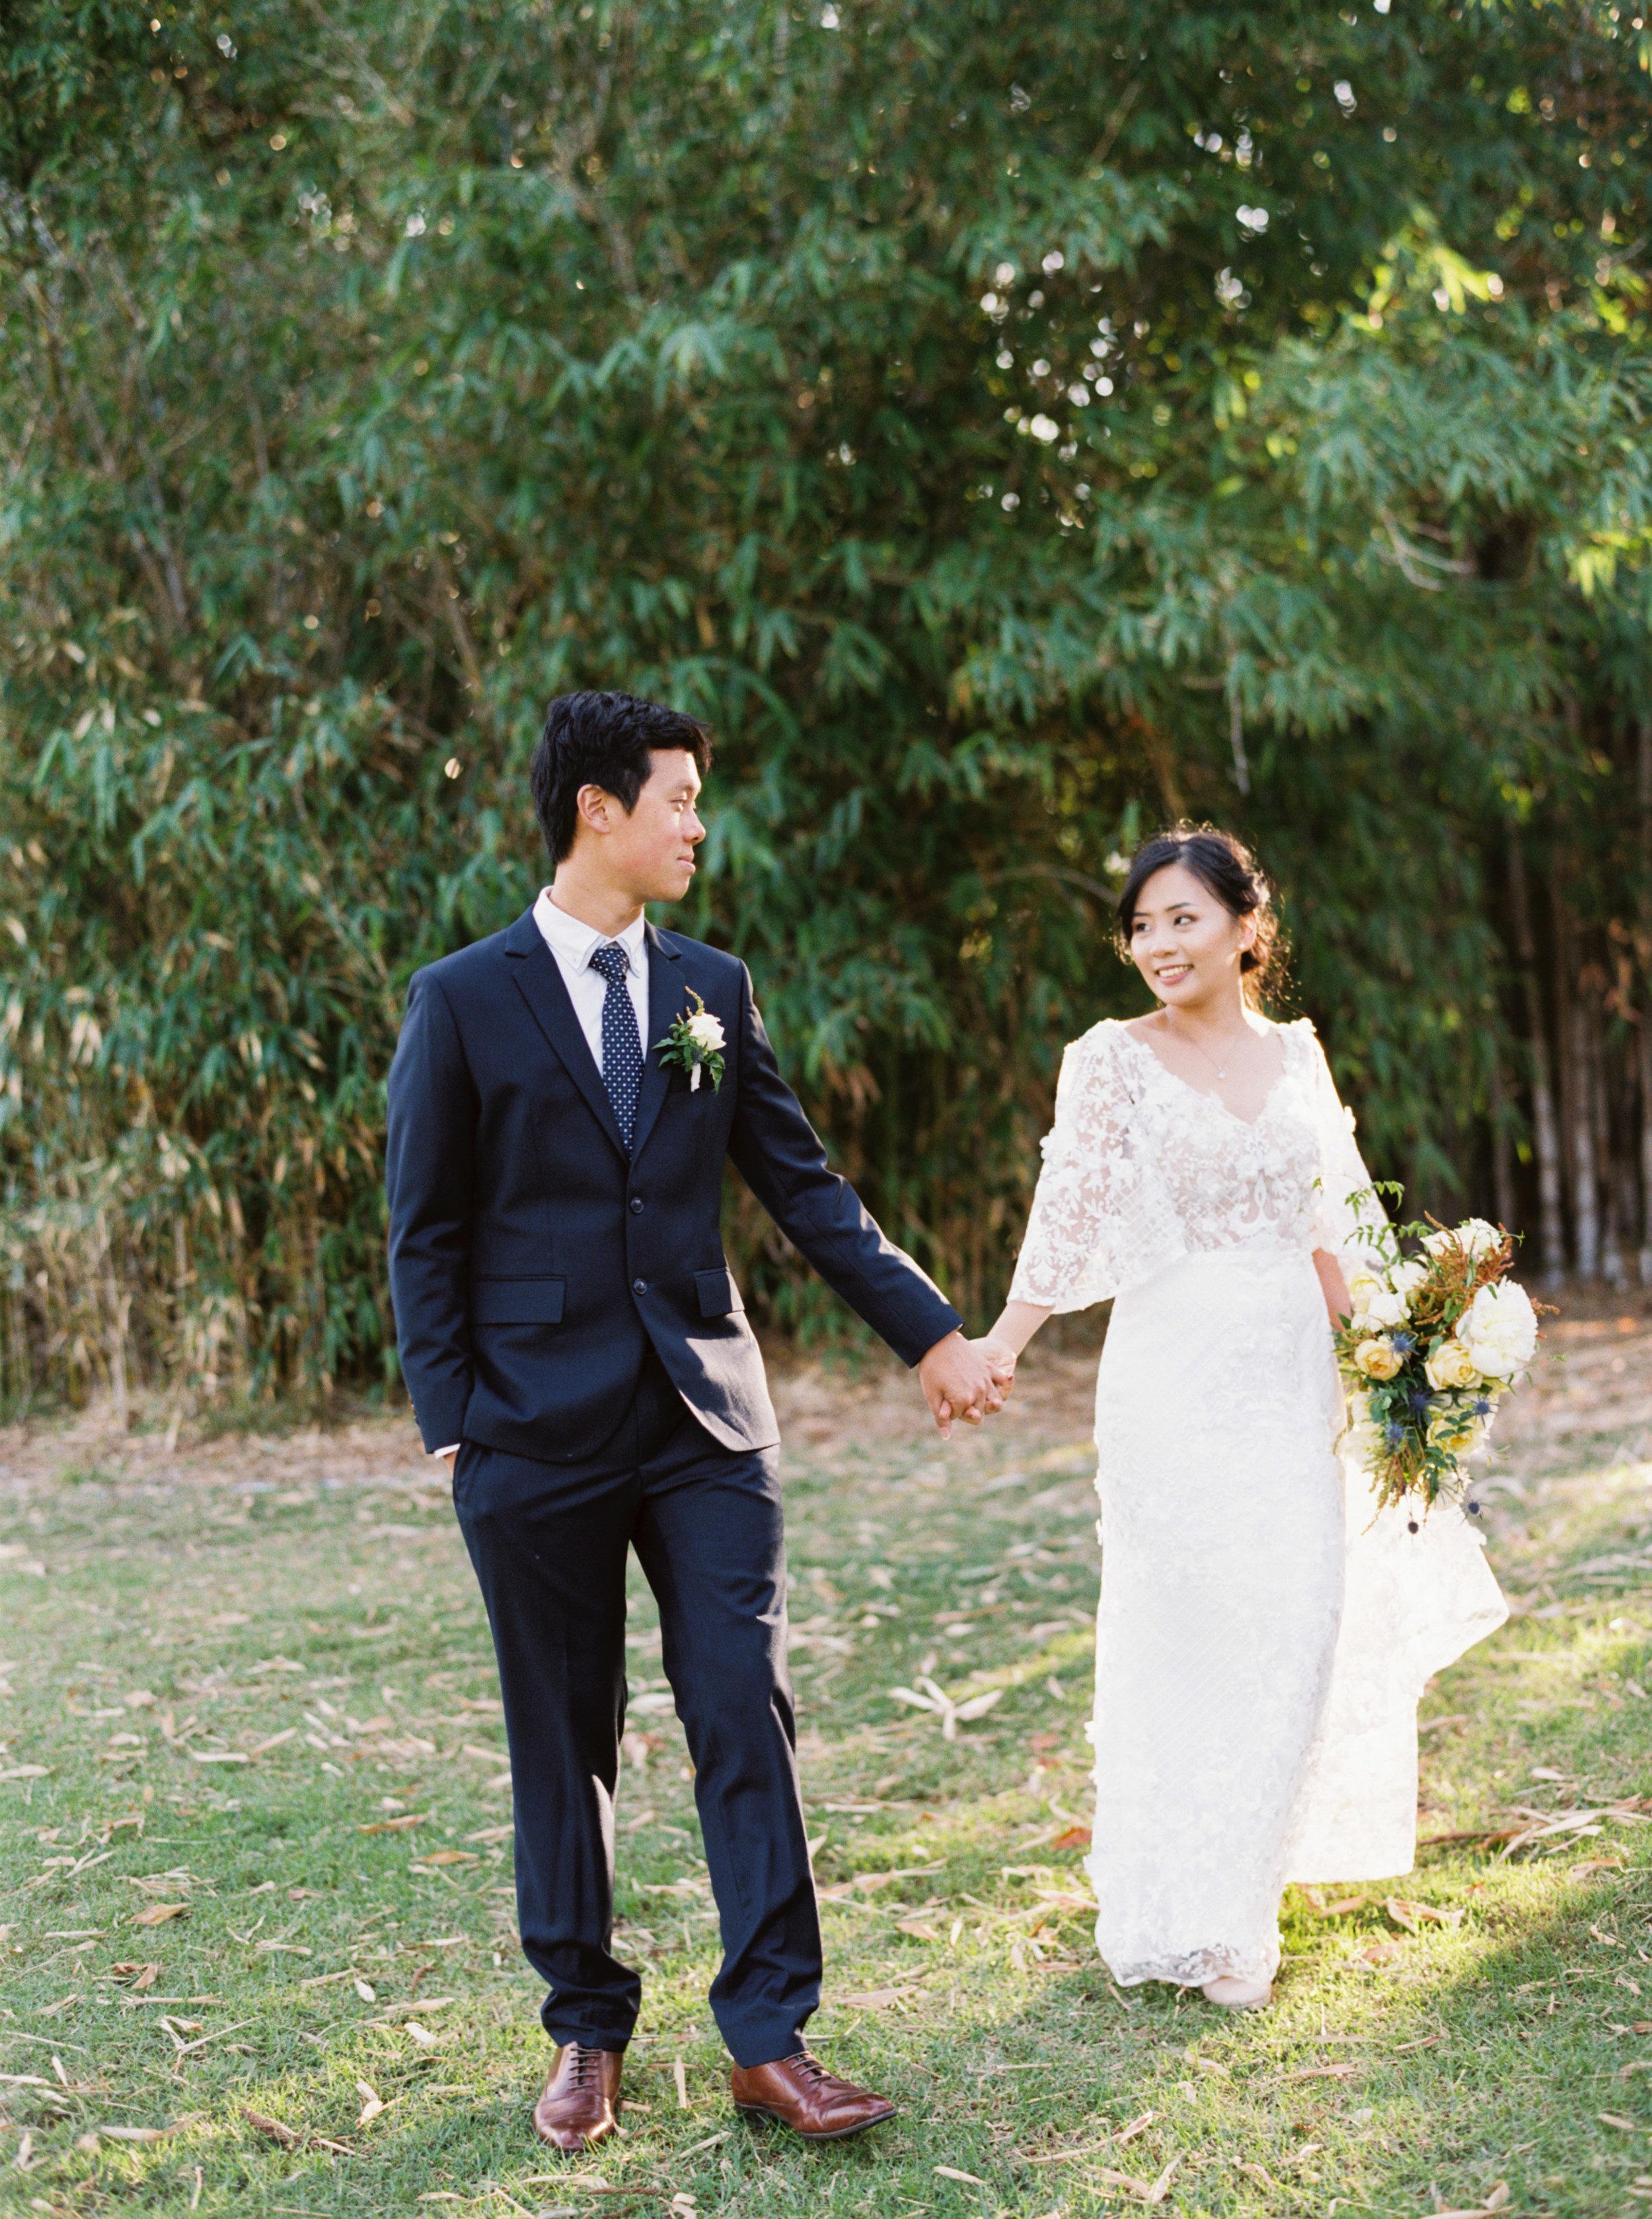 00028- Australia Sydney Wedding Photographer Sheri McMahon.jpg